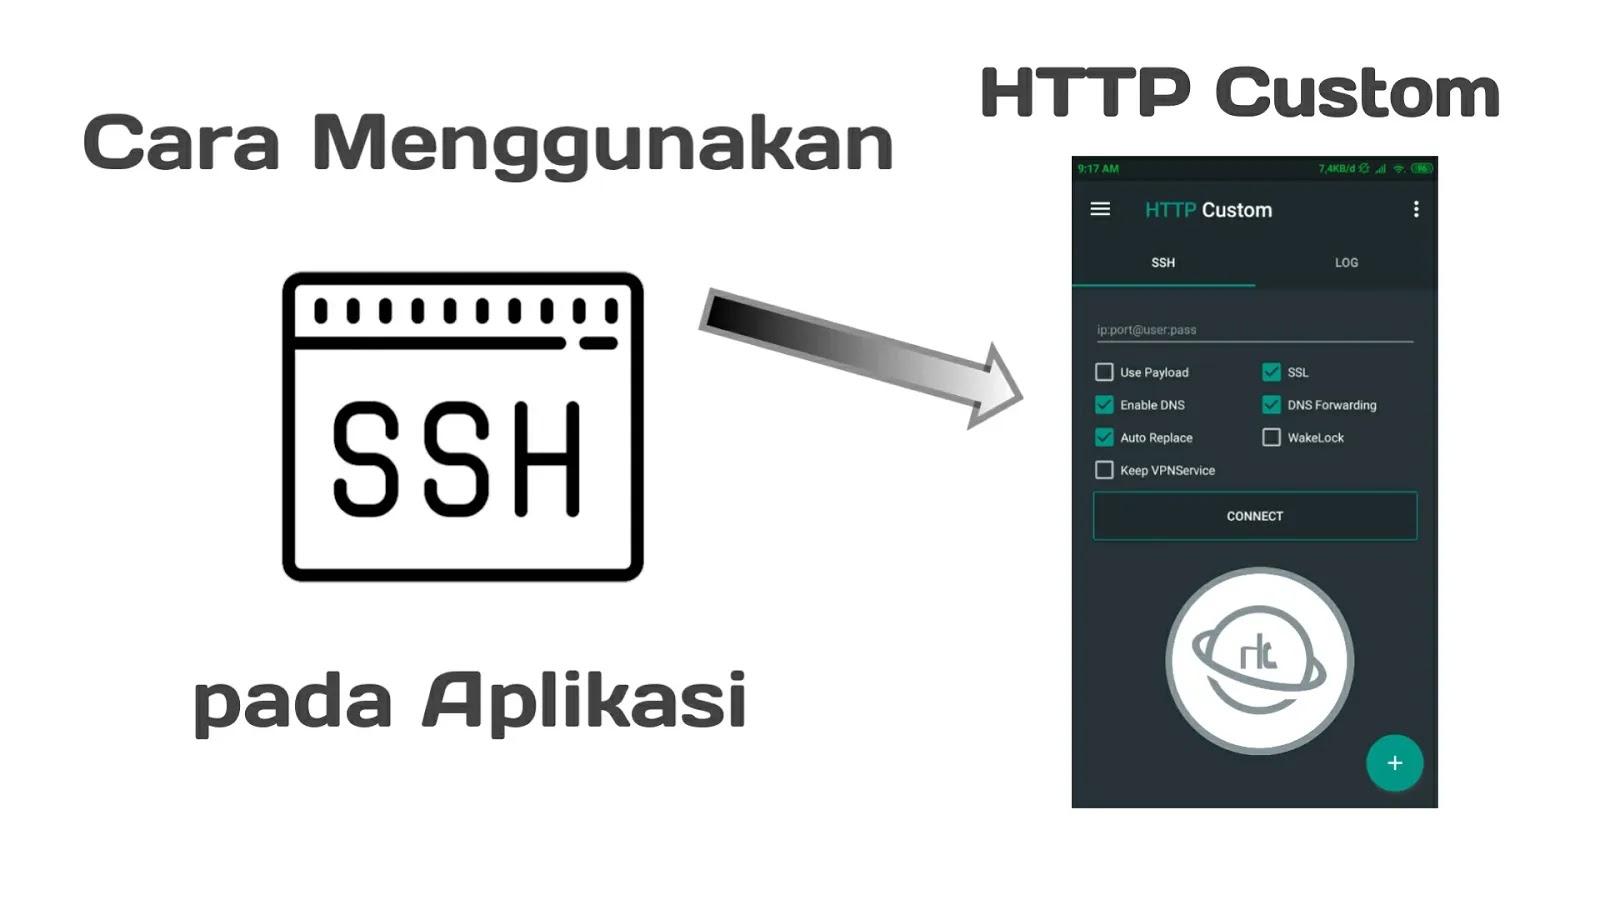 Cara Menggunakan SSH di Aplikasi HTTP Custom Android